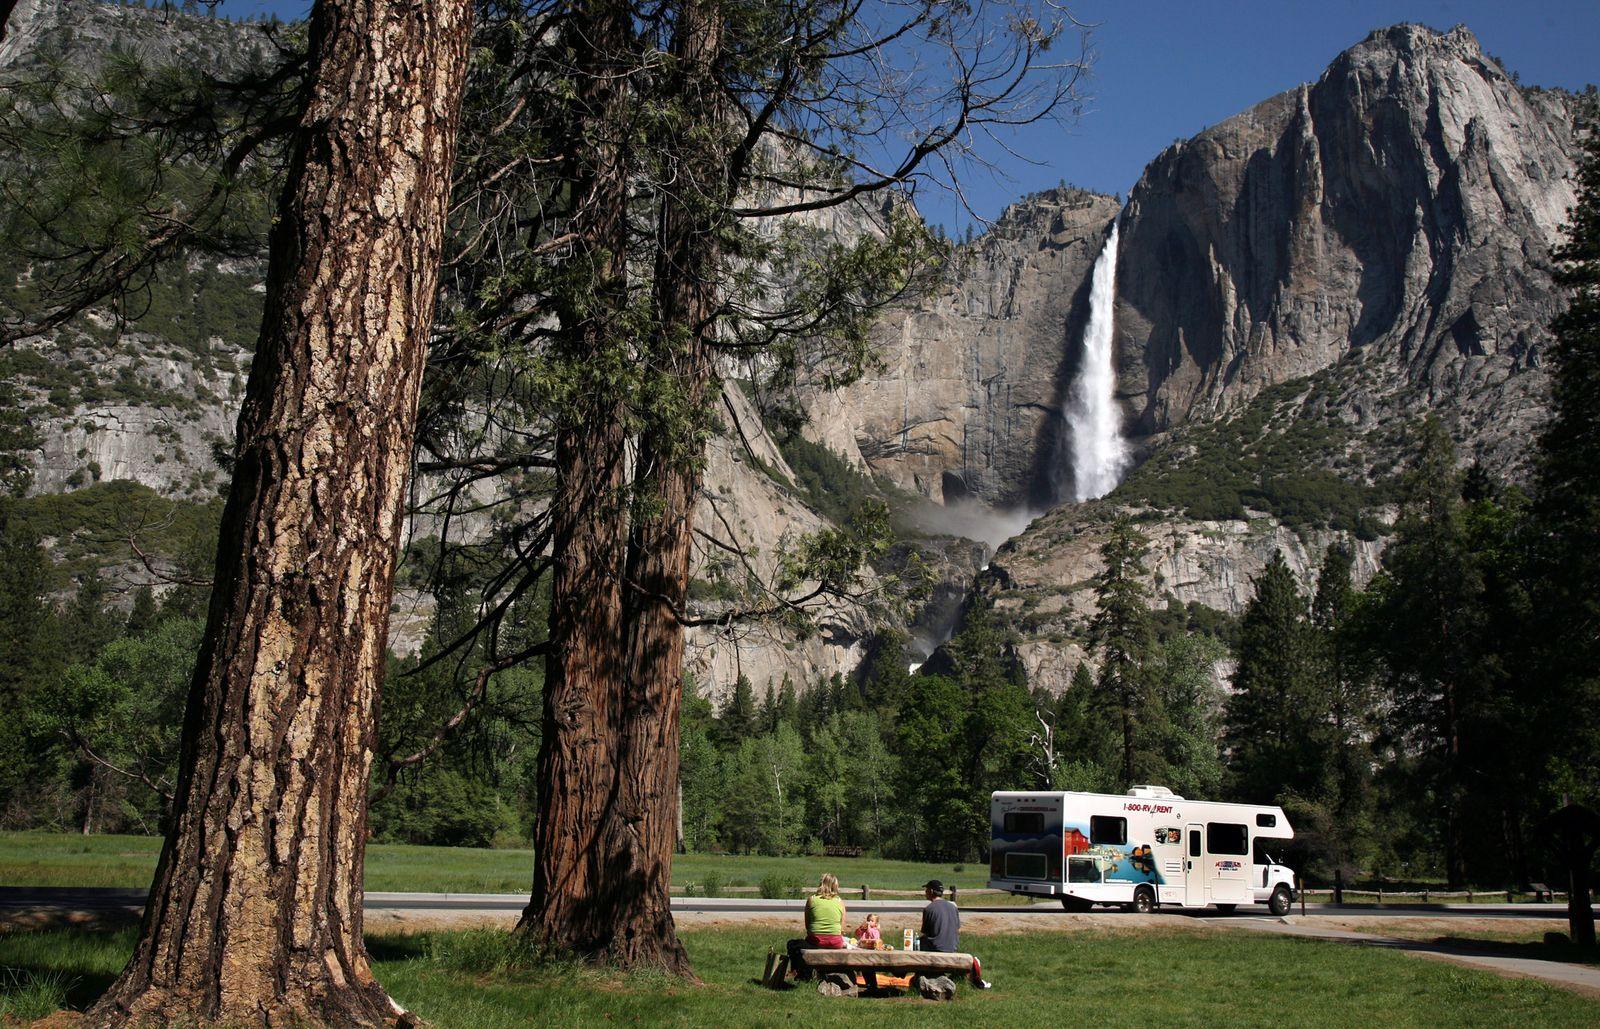 USA / Nationalpark / Yosemite